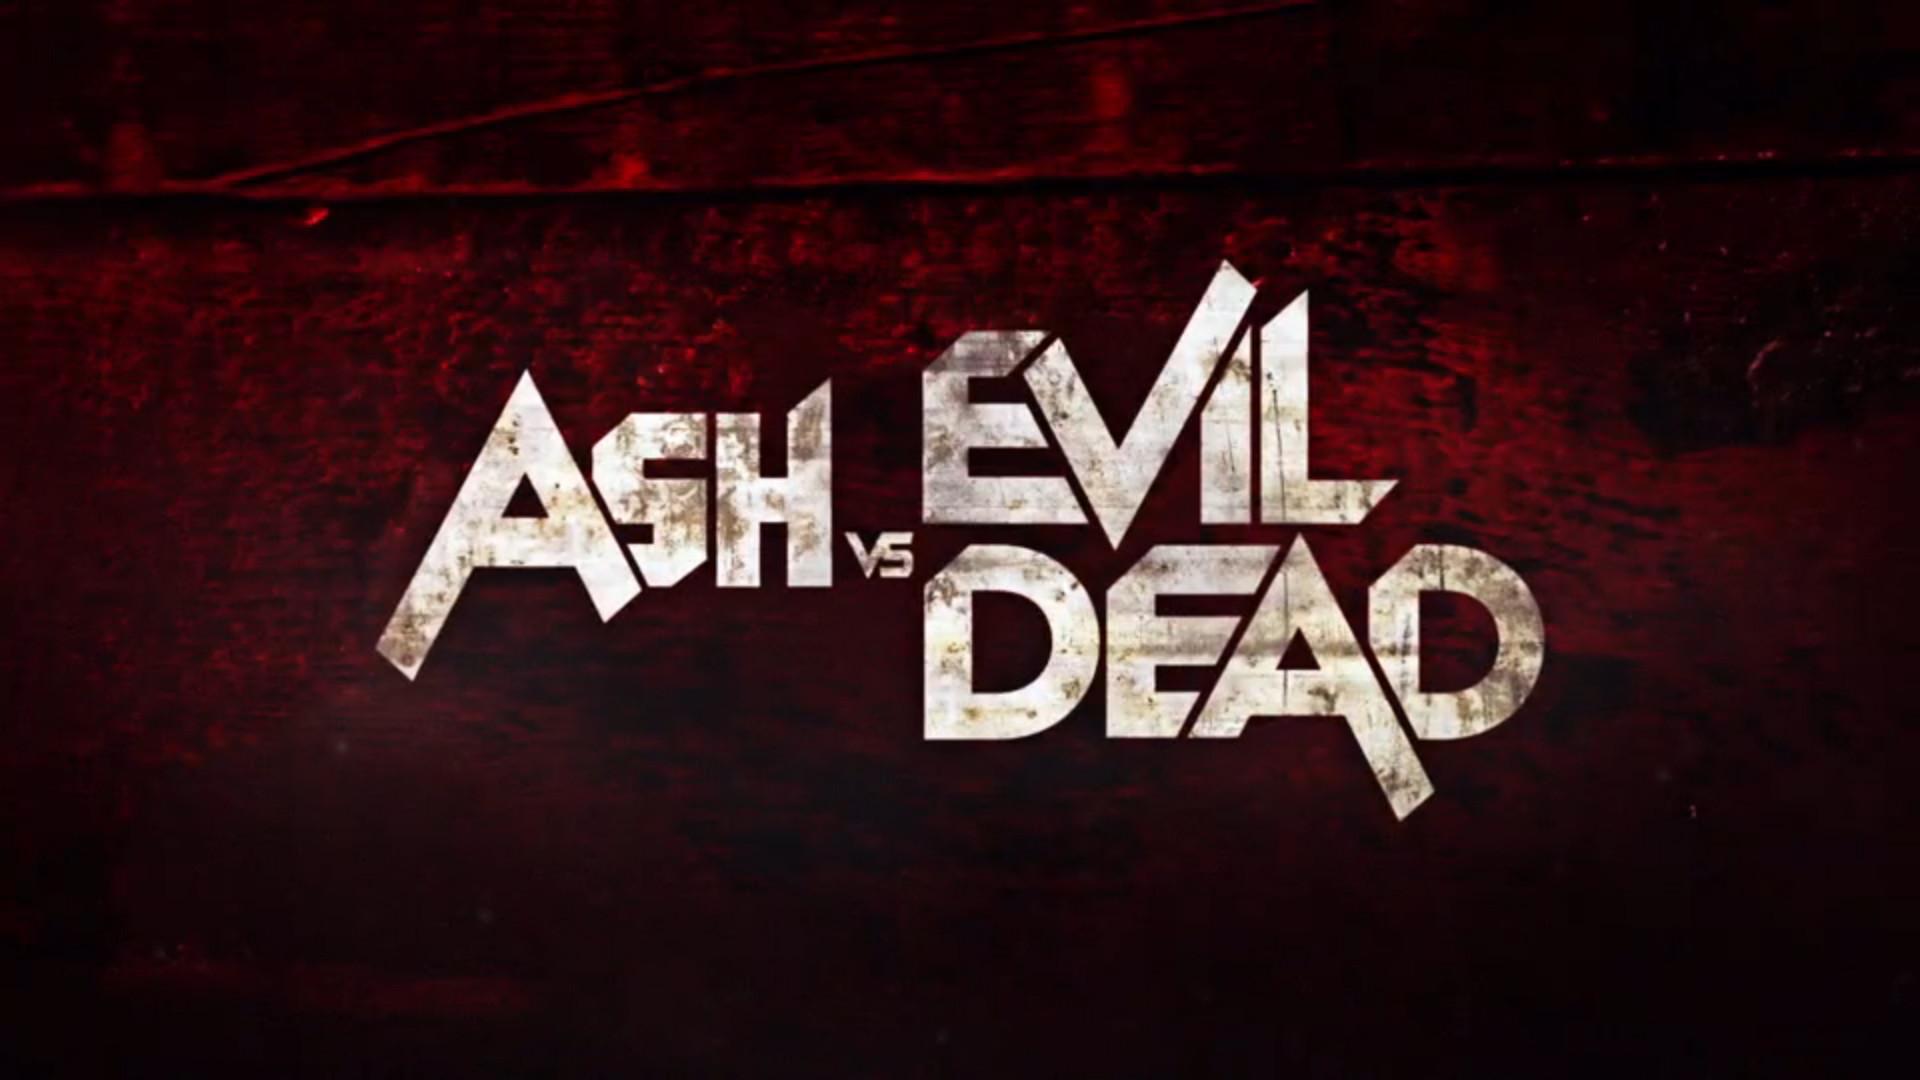 Ash vs Evil Dead Wallpapers   Just Good Vibe